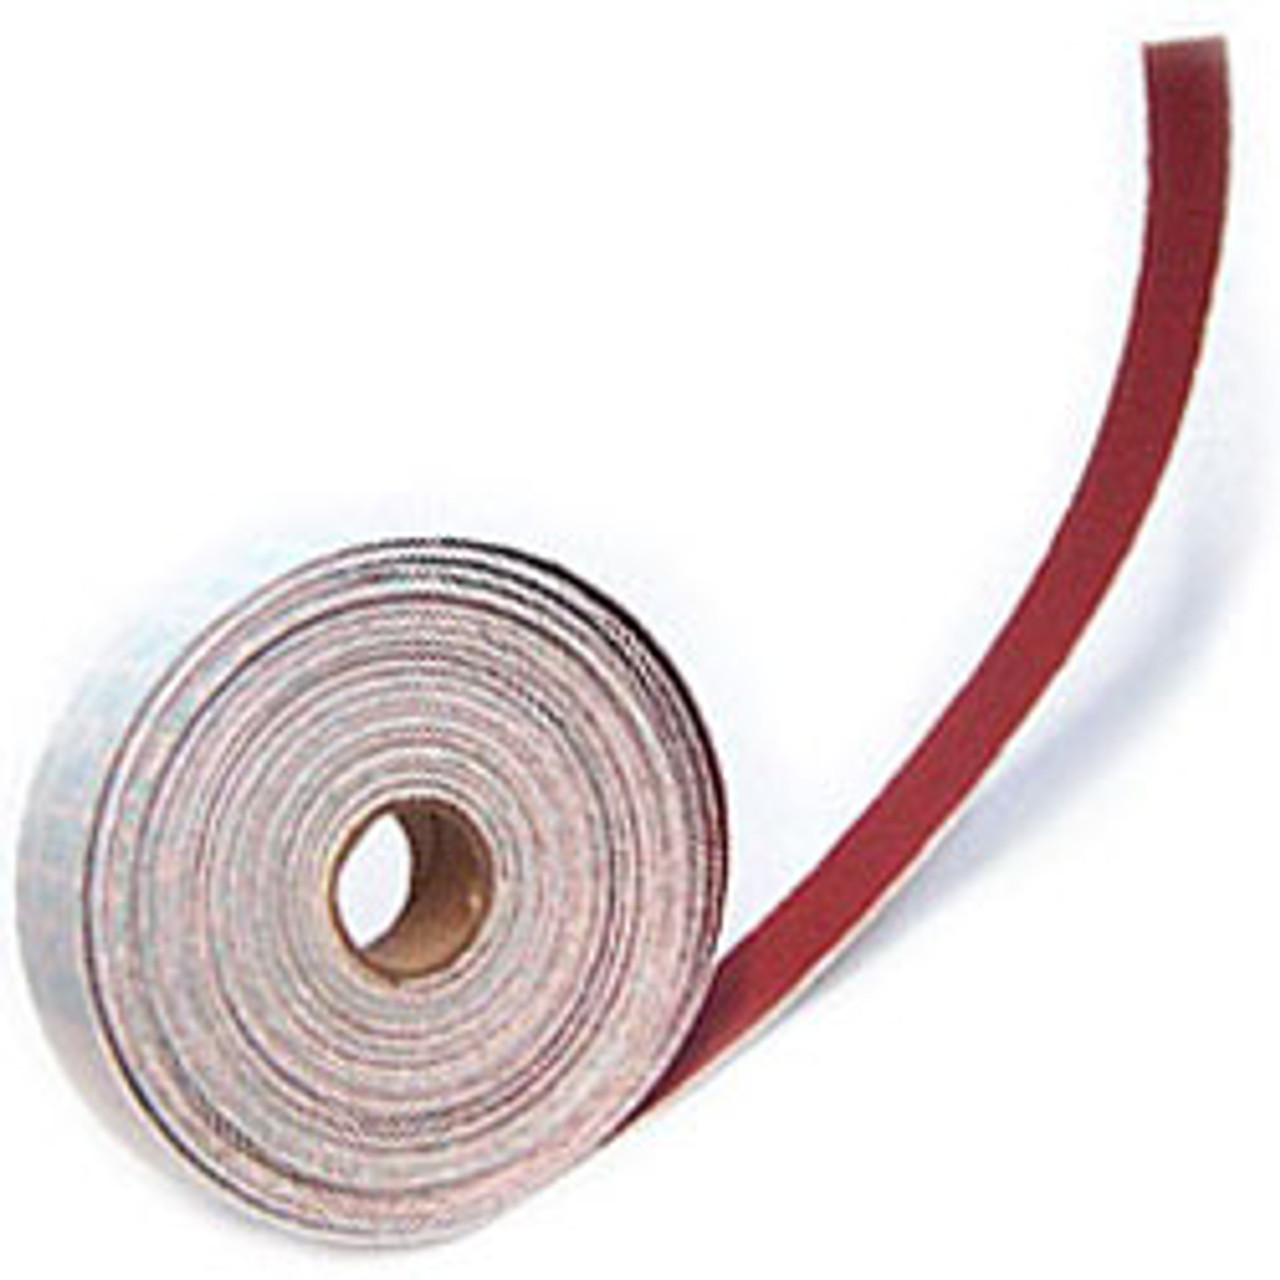 "Klingspor Abrasives Heavyweight Aluminum Oxide, 1-1/8""x 10 Meter (33') Hook & Loop Roll, 120 Grit"